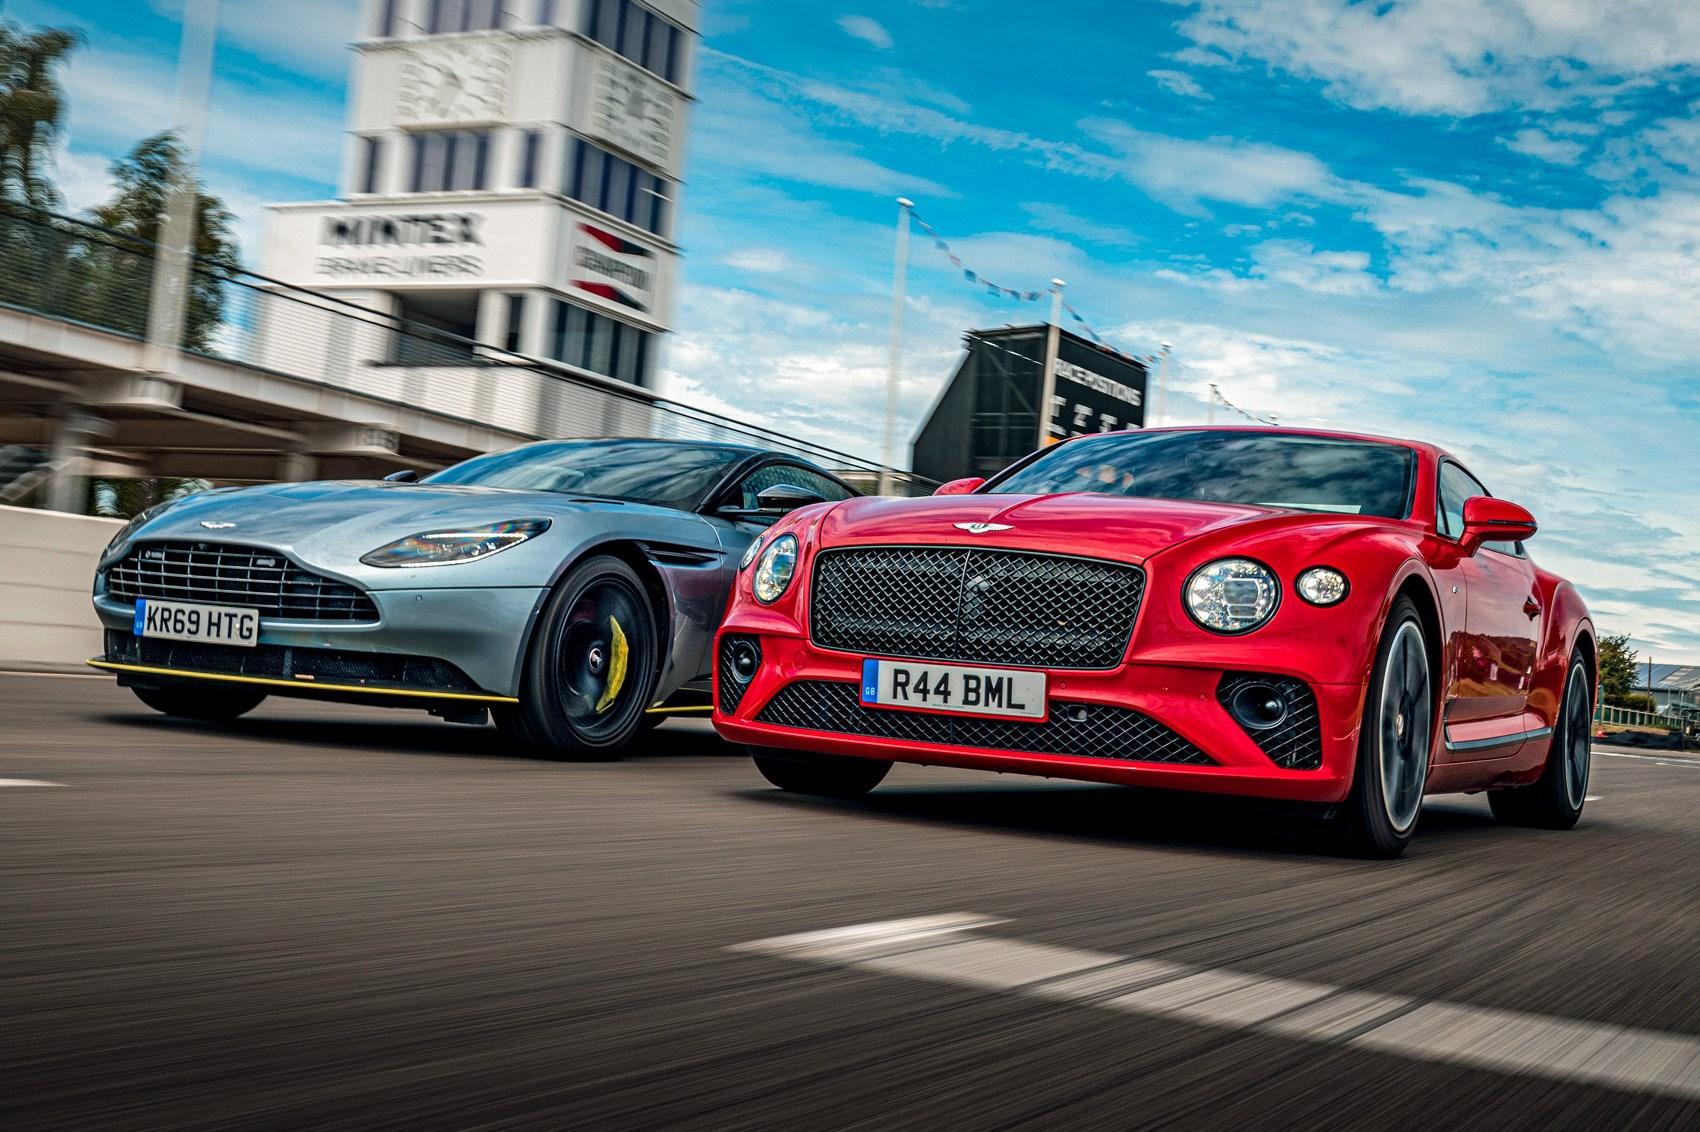 Aston Martin Db11 Amr Vs Bentley Continental Gt Long Termer Twin Test Review Car Magazine